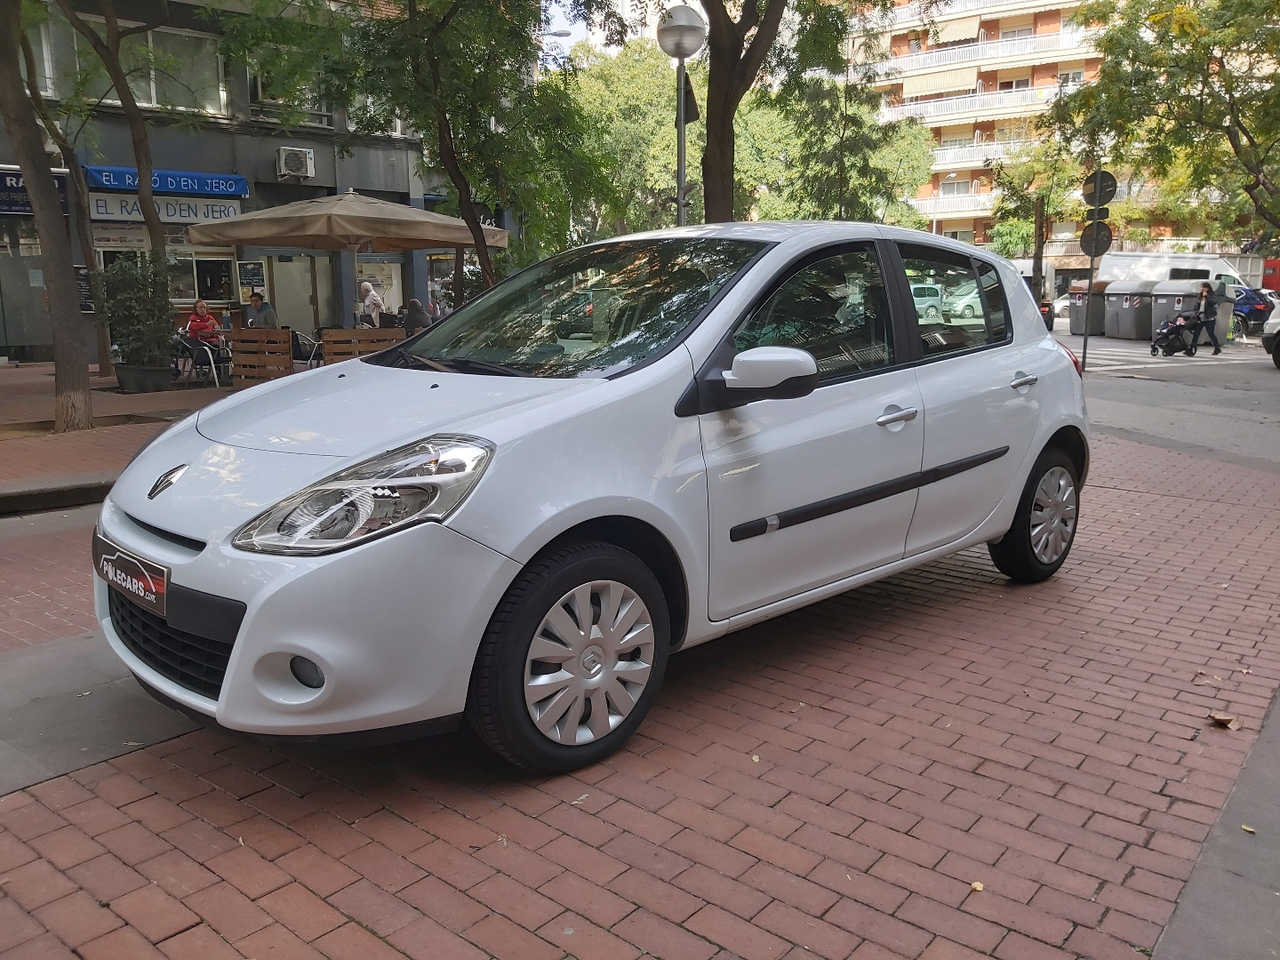 Renault Clio 1.2 75cv EXPRESSION   - Foto 1